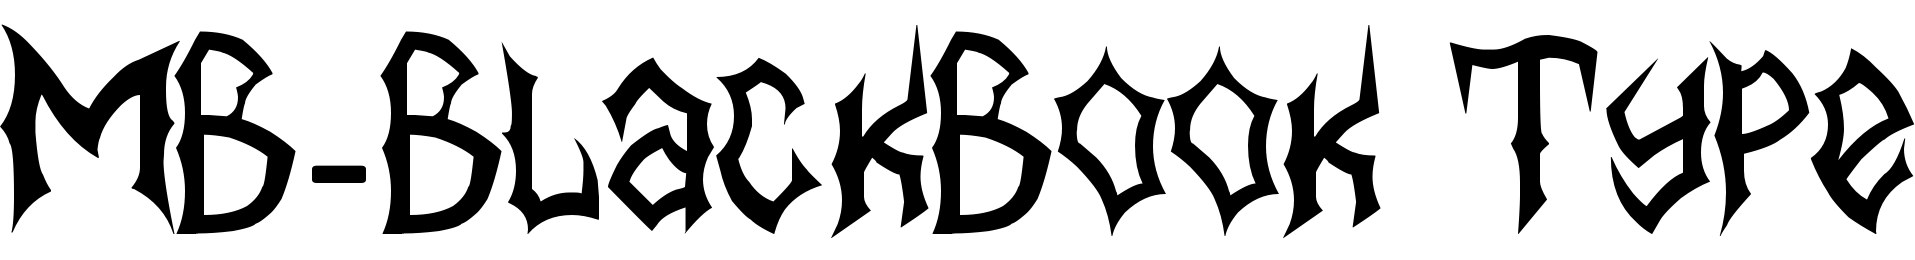 MB-BlackBook Type